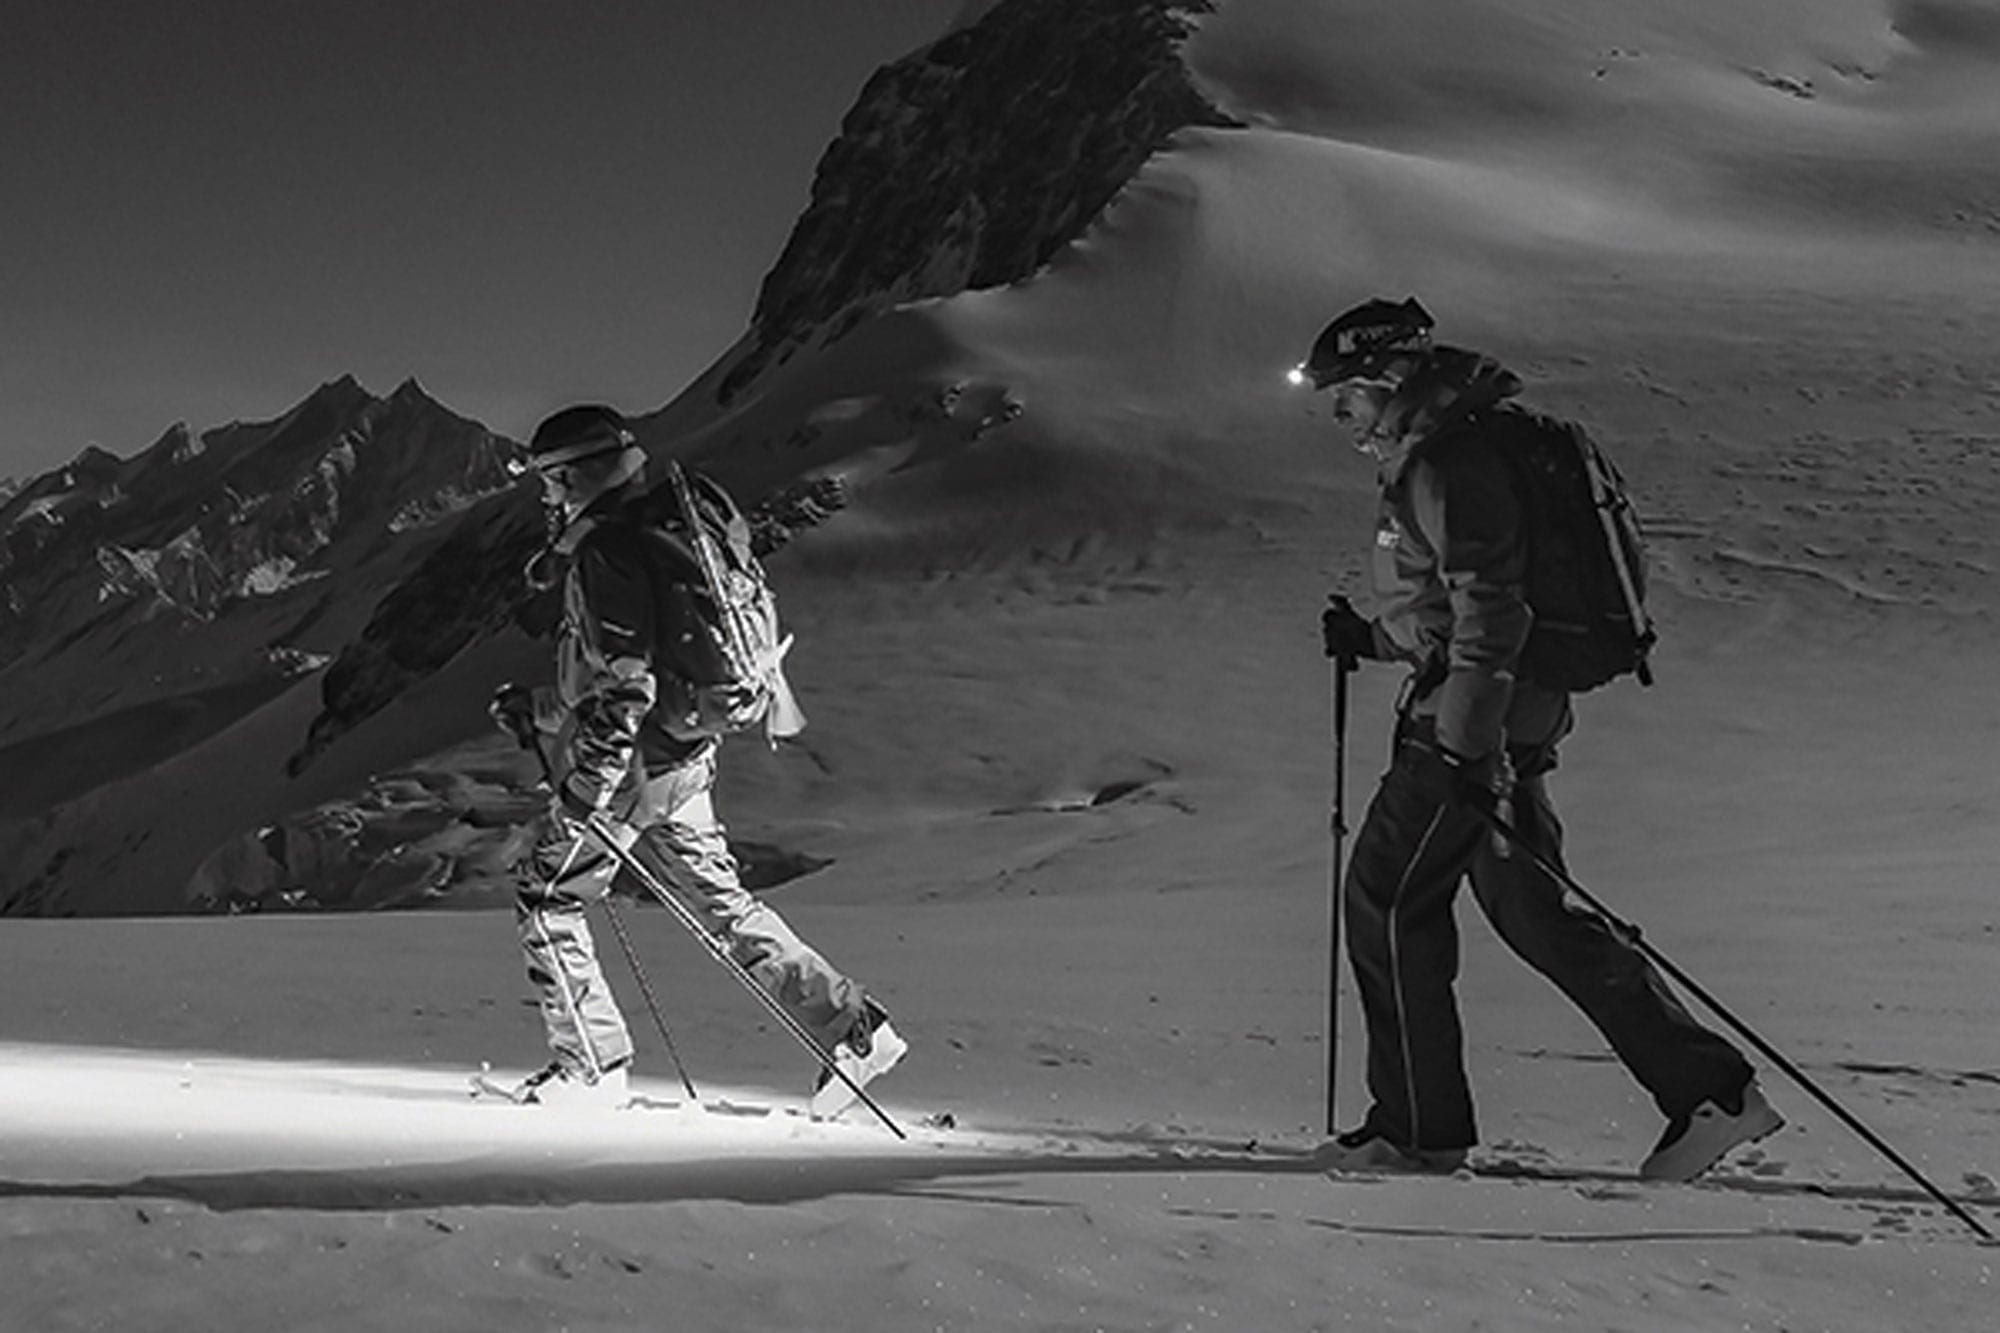 Skitour im Dunkeln